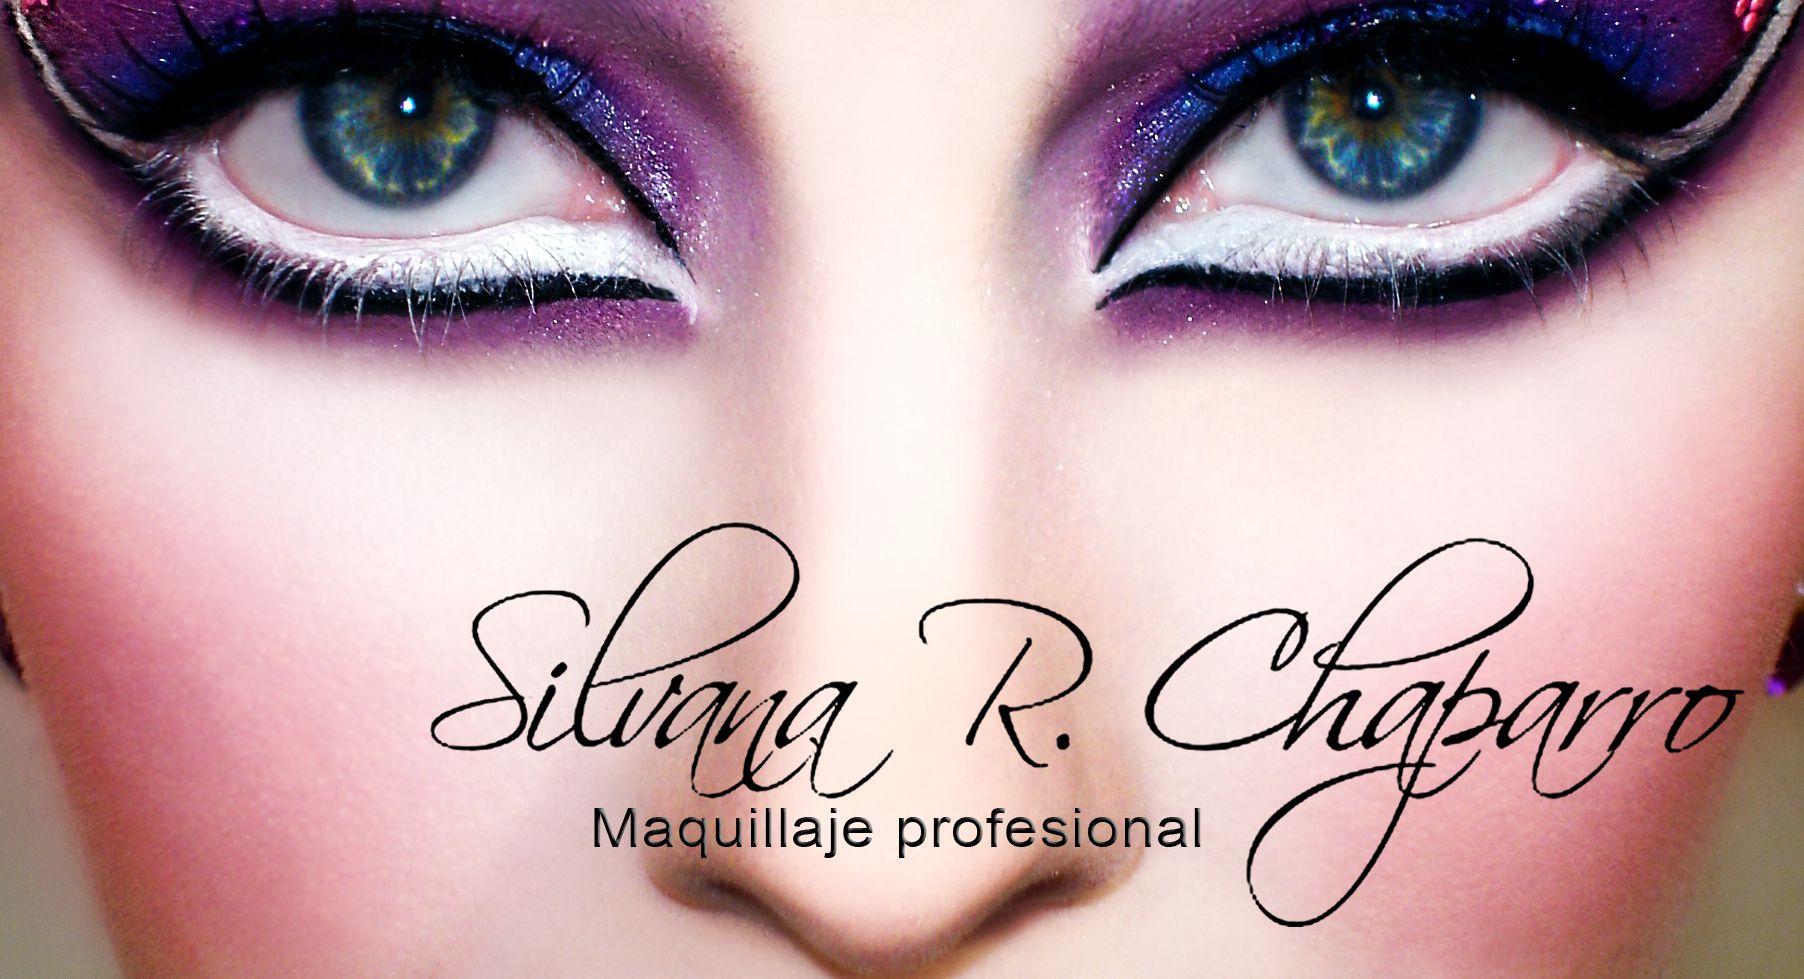 Maquillaje artistico www.facebook.com/silvanarocio.chaparro #art #make up #purple #blue #pink #blue eyes